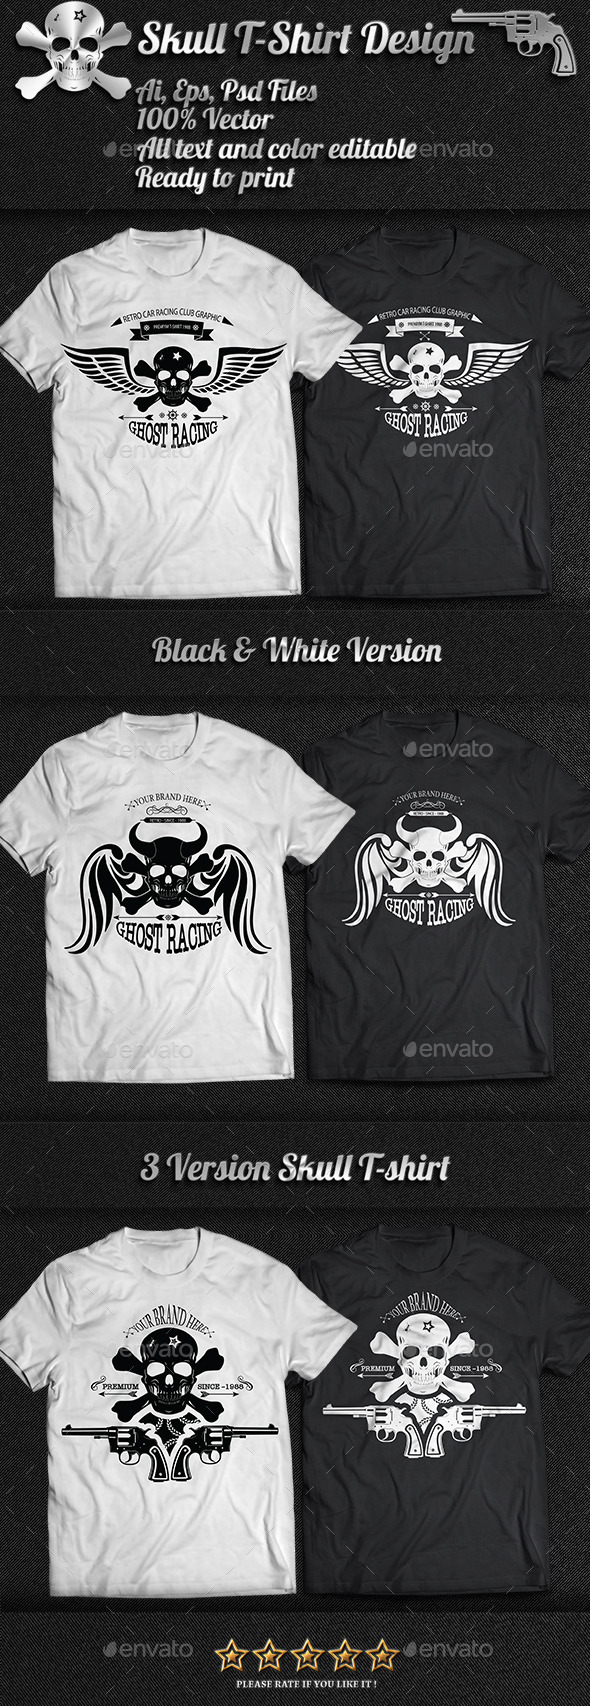 3 Skull T-Shirt Design - Designs T-Shirts